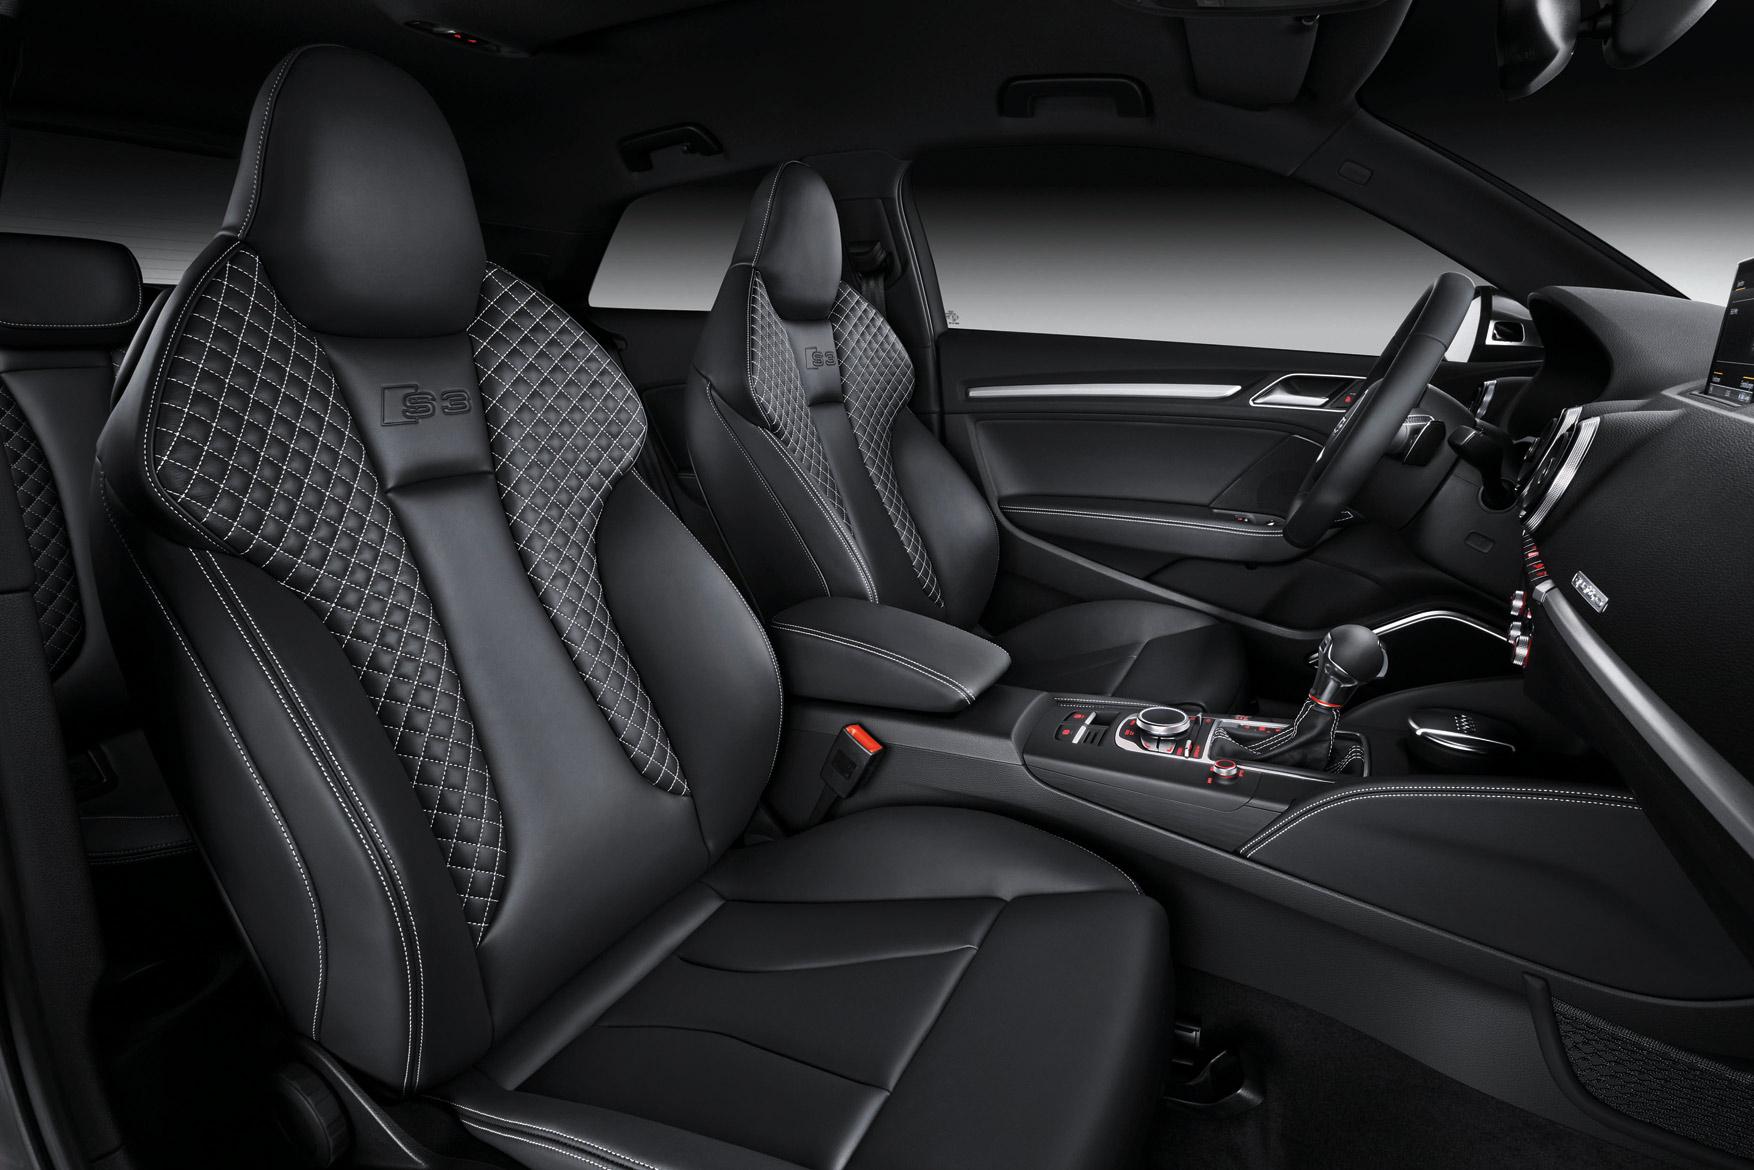 Audi A3 Cabriolet Art Car GOMA Neoprene 661 110x60 photo